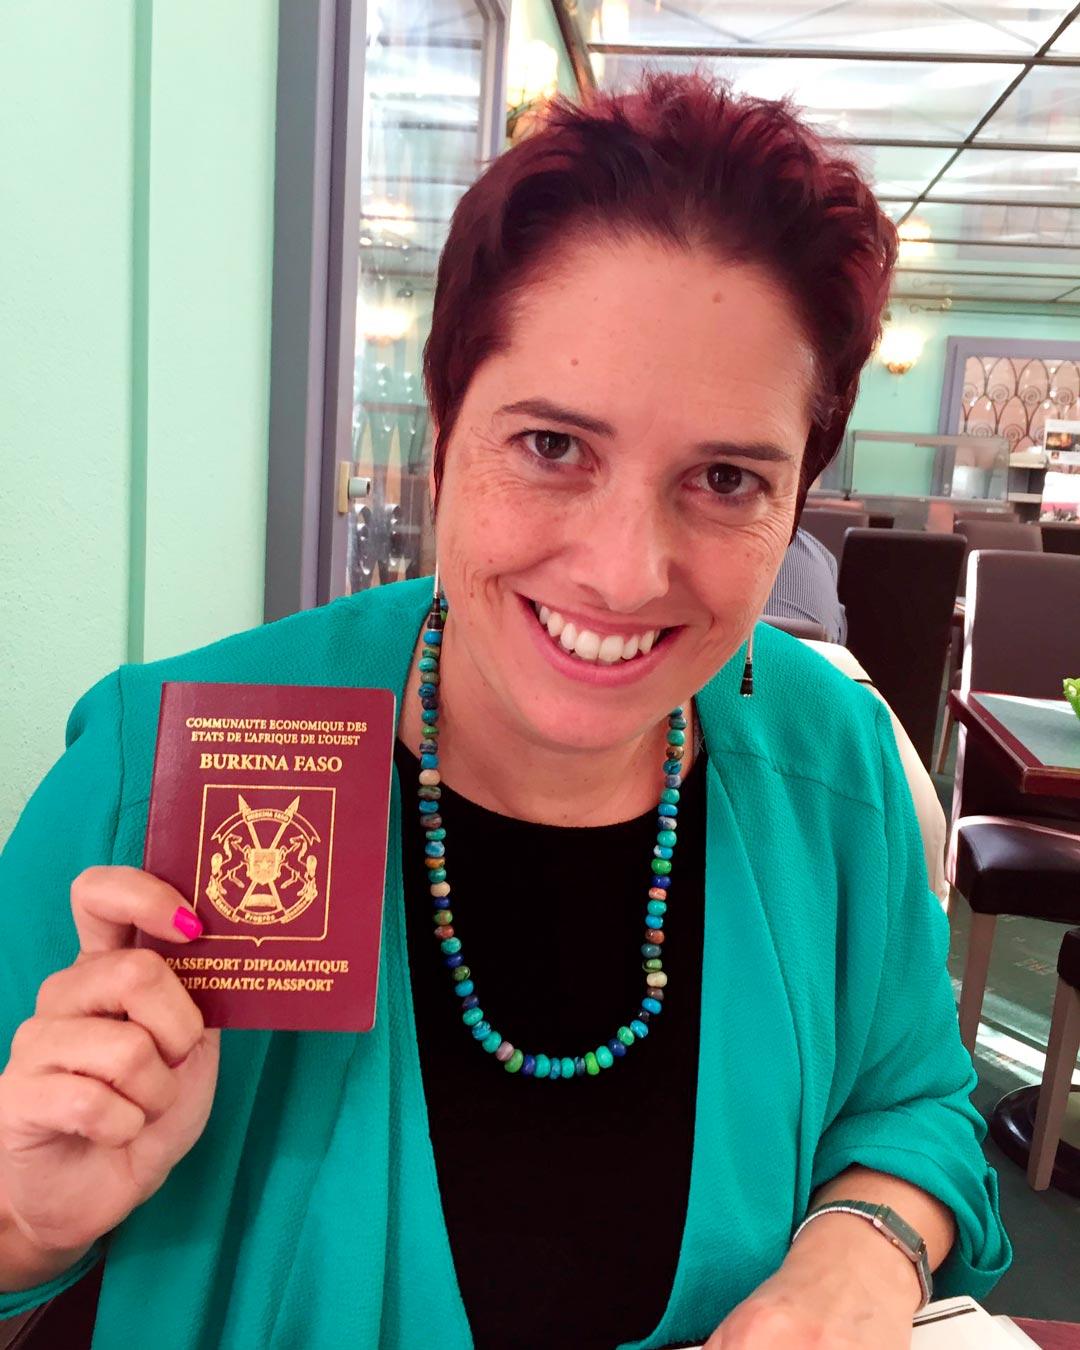 Isabelle Chevalley présente son passeport burkinabé